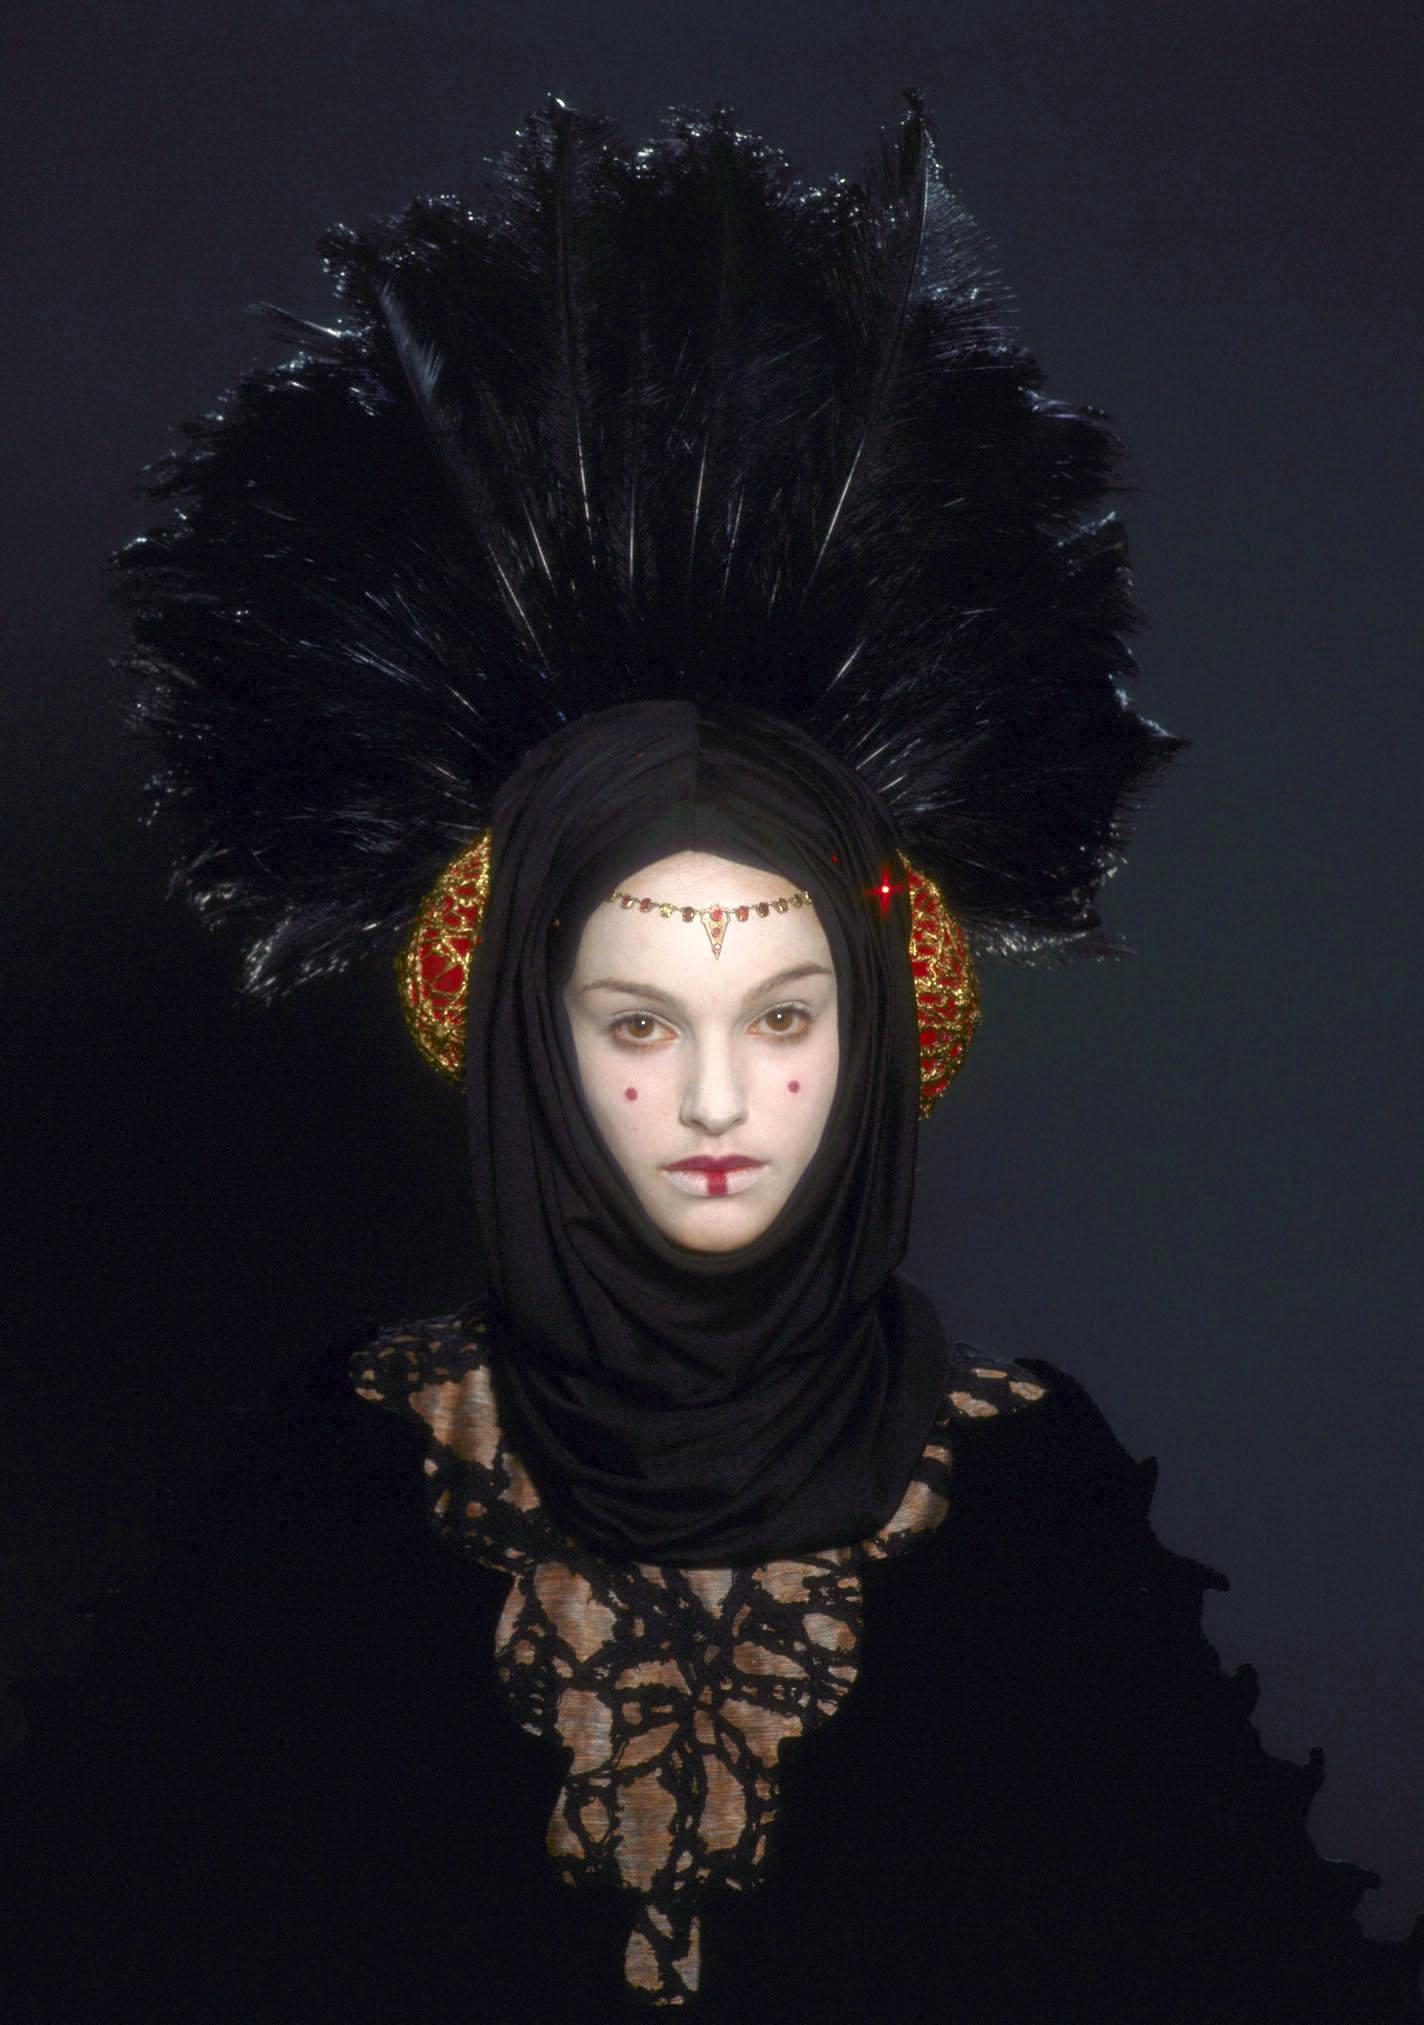 Keira Knightley Queen Amidala